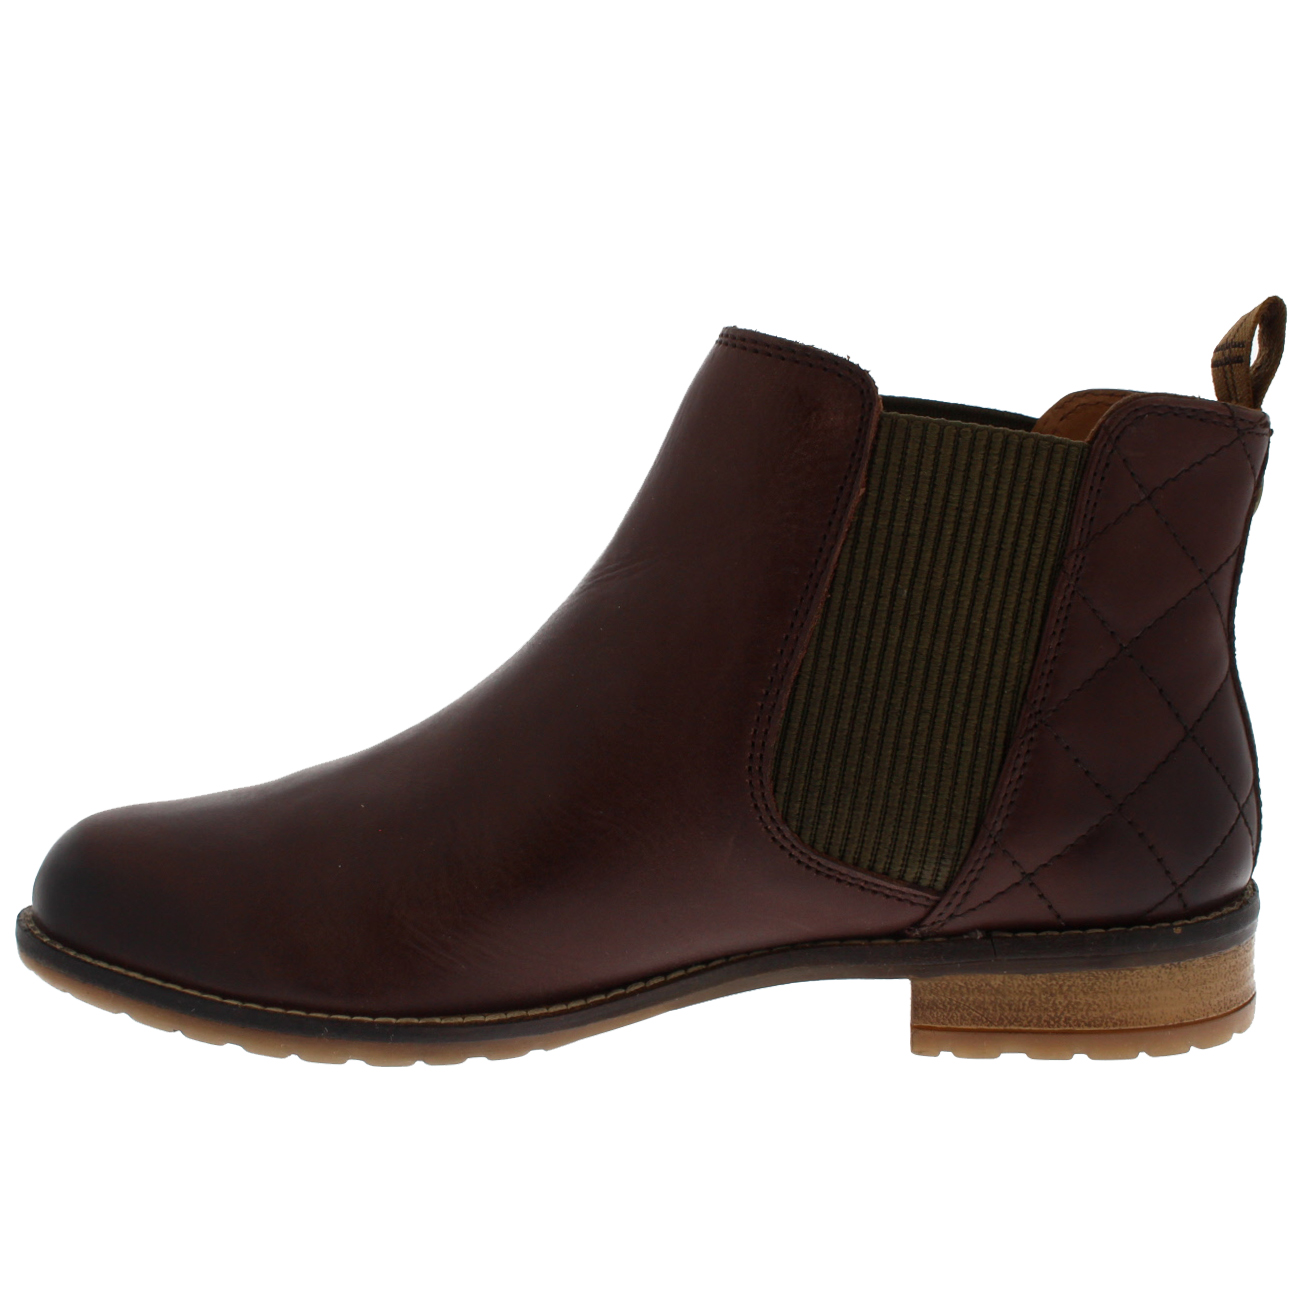 Damenschuhe Barbour Abigail Stiefel Casual Leder Smart Winter Ankle Heeled Stiefel Abigail US 4.5-9.5 7275b5